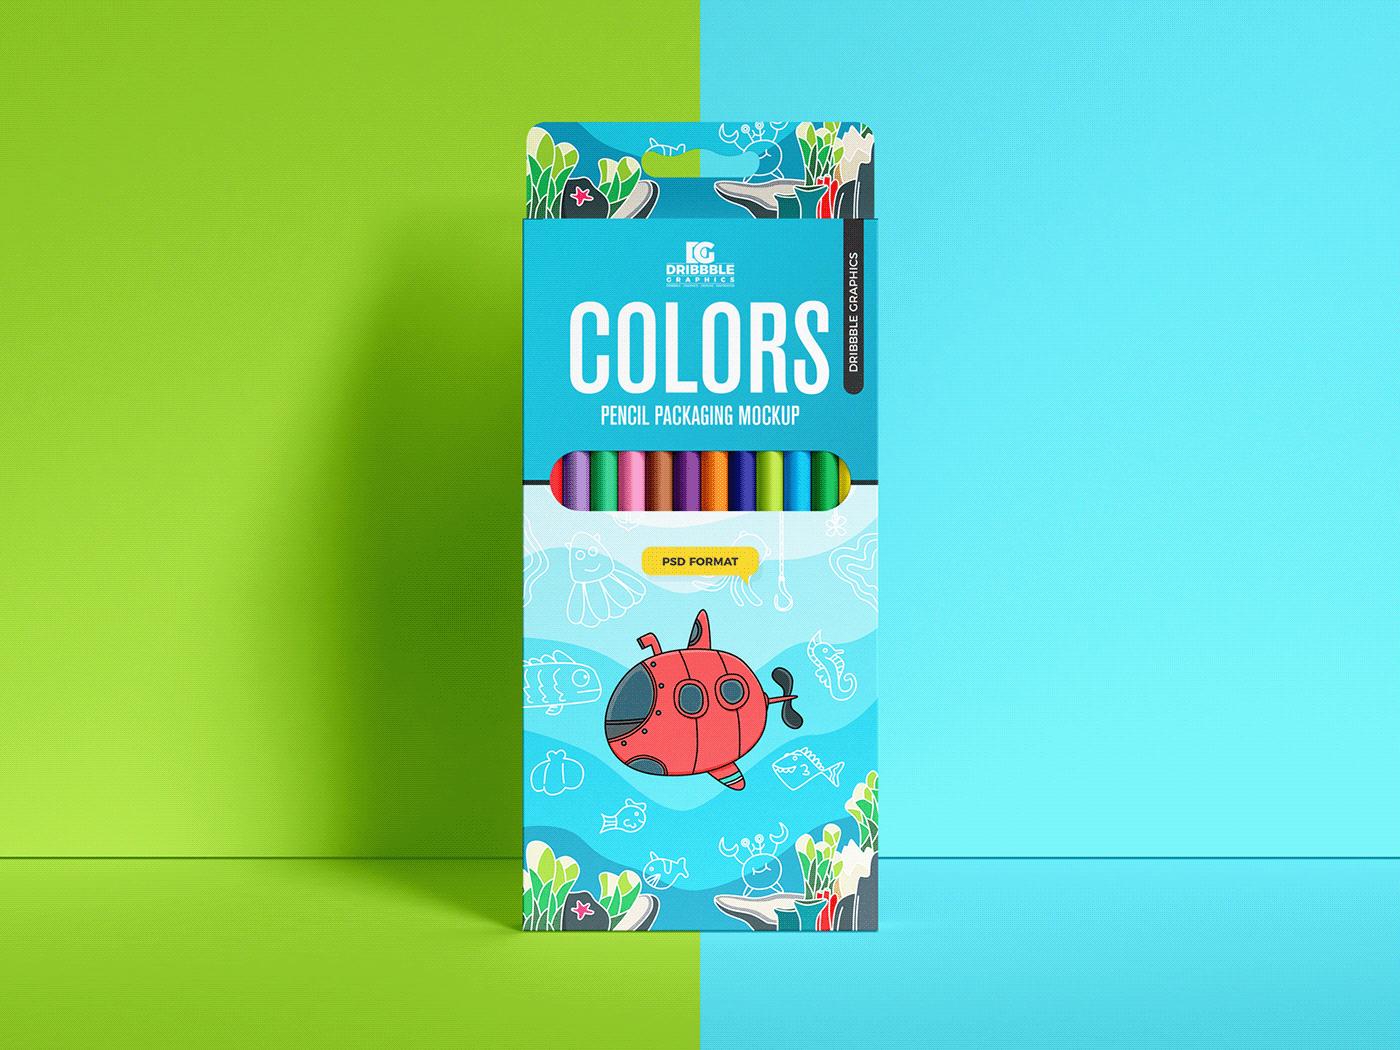 box mockup free mockup  freebies Mockup mockup free mockup psd packaging mockup pencil colors Pencil Colors Mockup psd